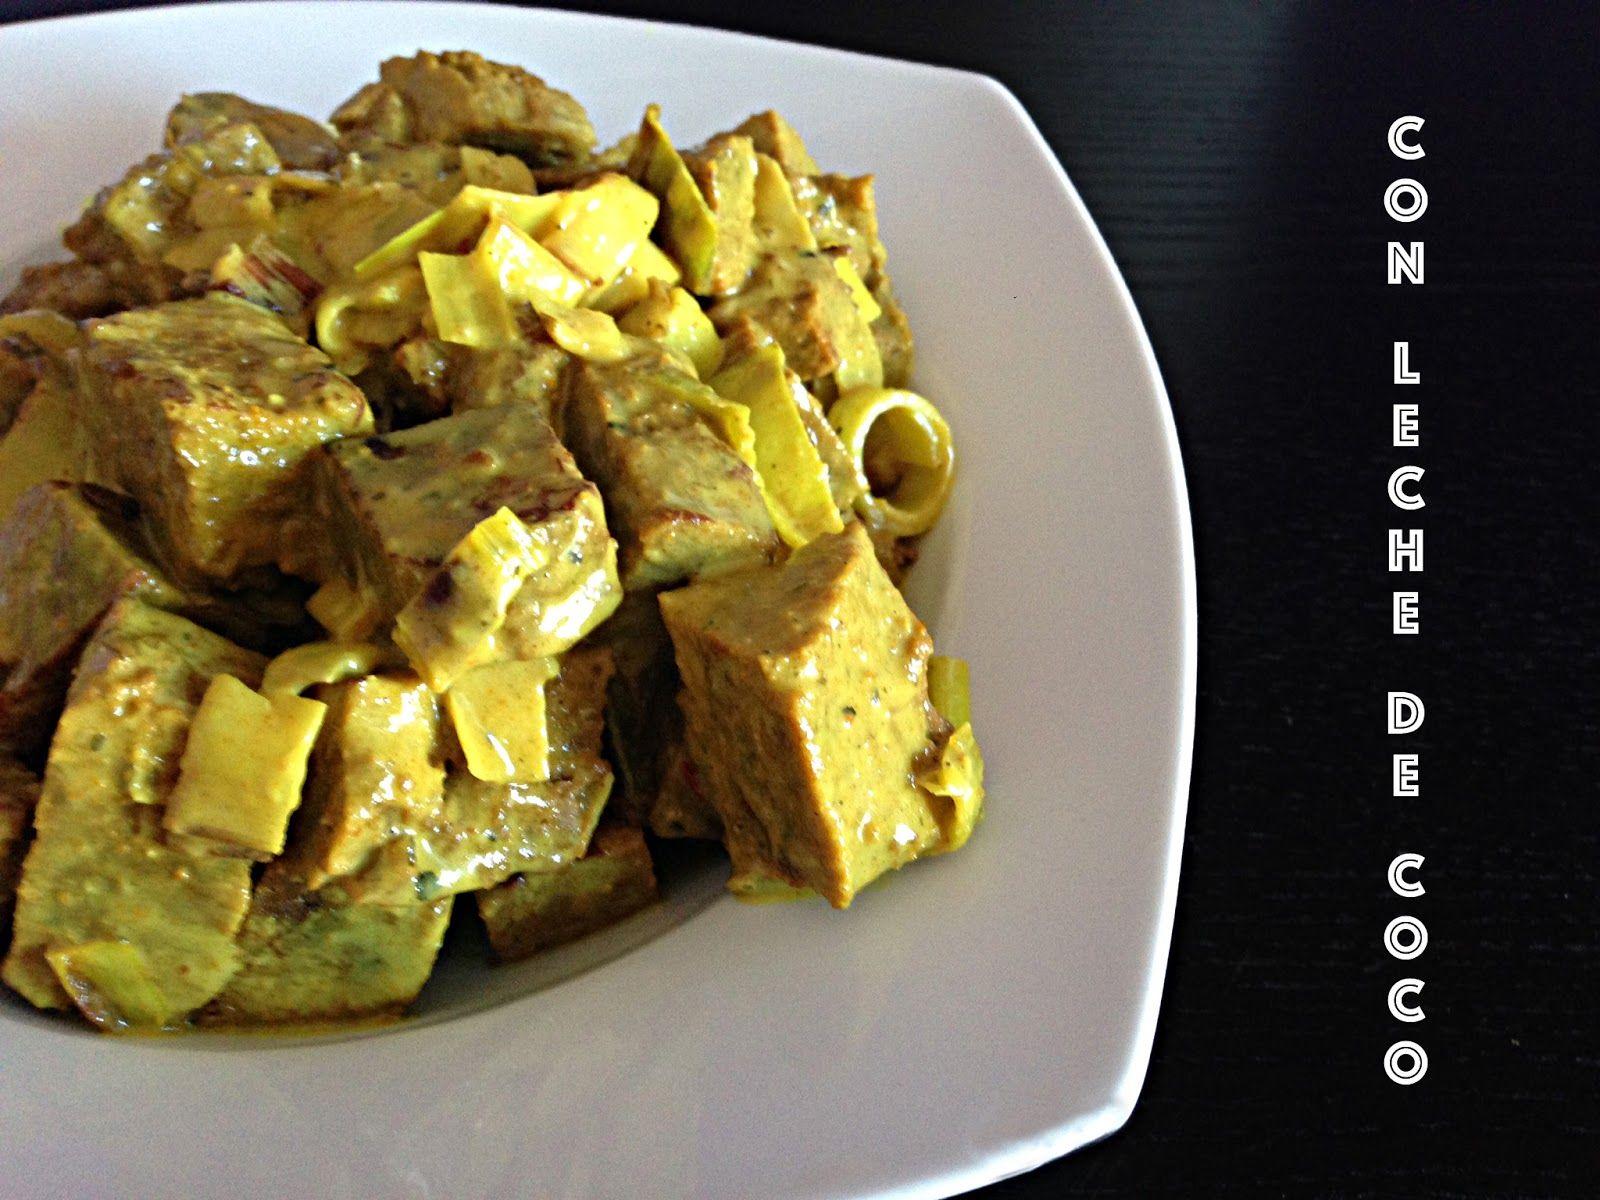 Como Cocinar El Seitan | Estofado De Seitan En Leche De Coco Recetas Para Cocinar